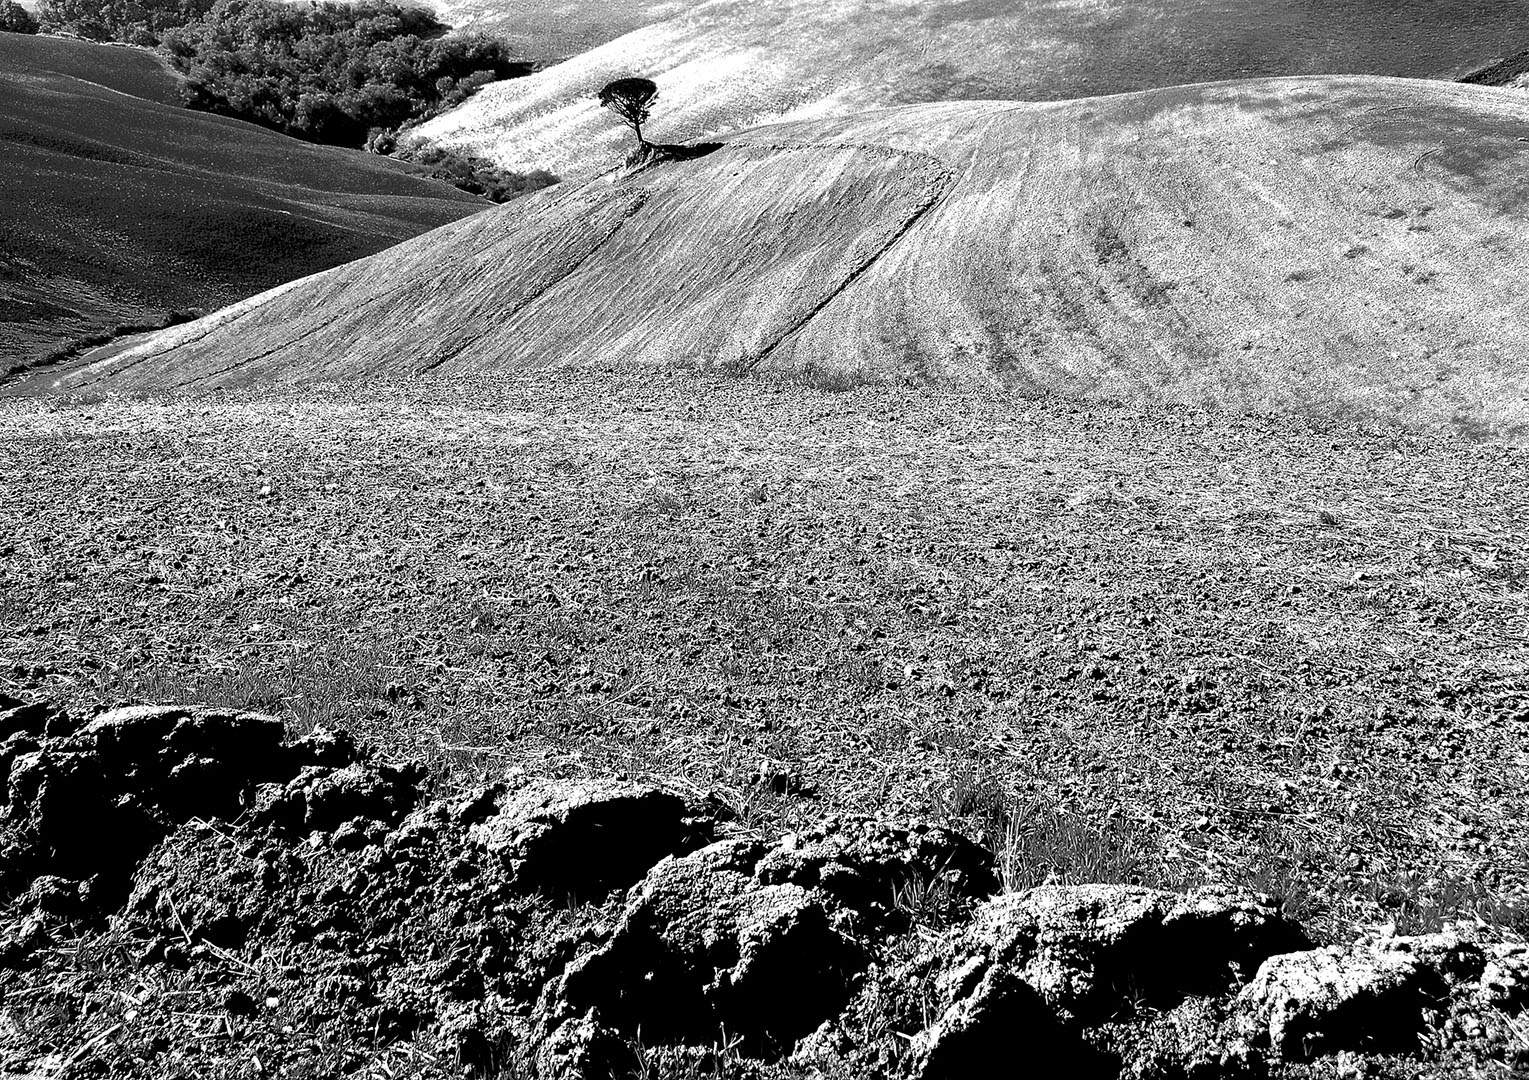 Toscana_020_I10.1-37